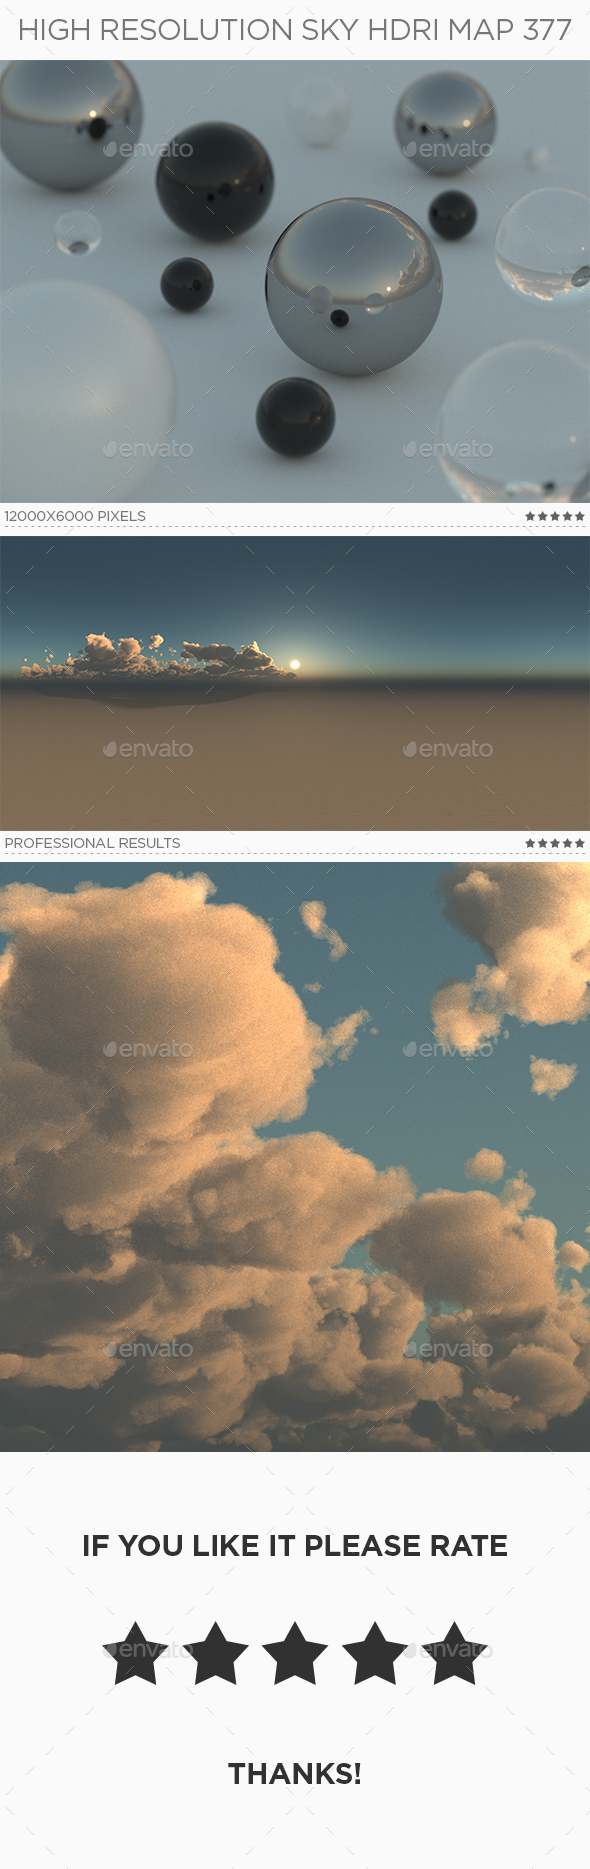 High Resolution Sky HDRi Map 377 - 3DOcean Item for Sale